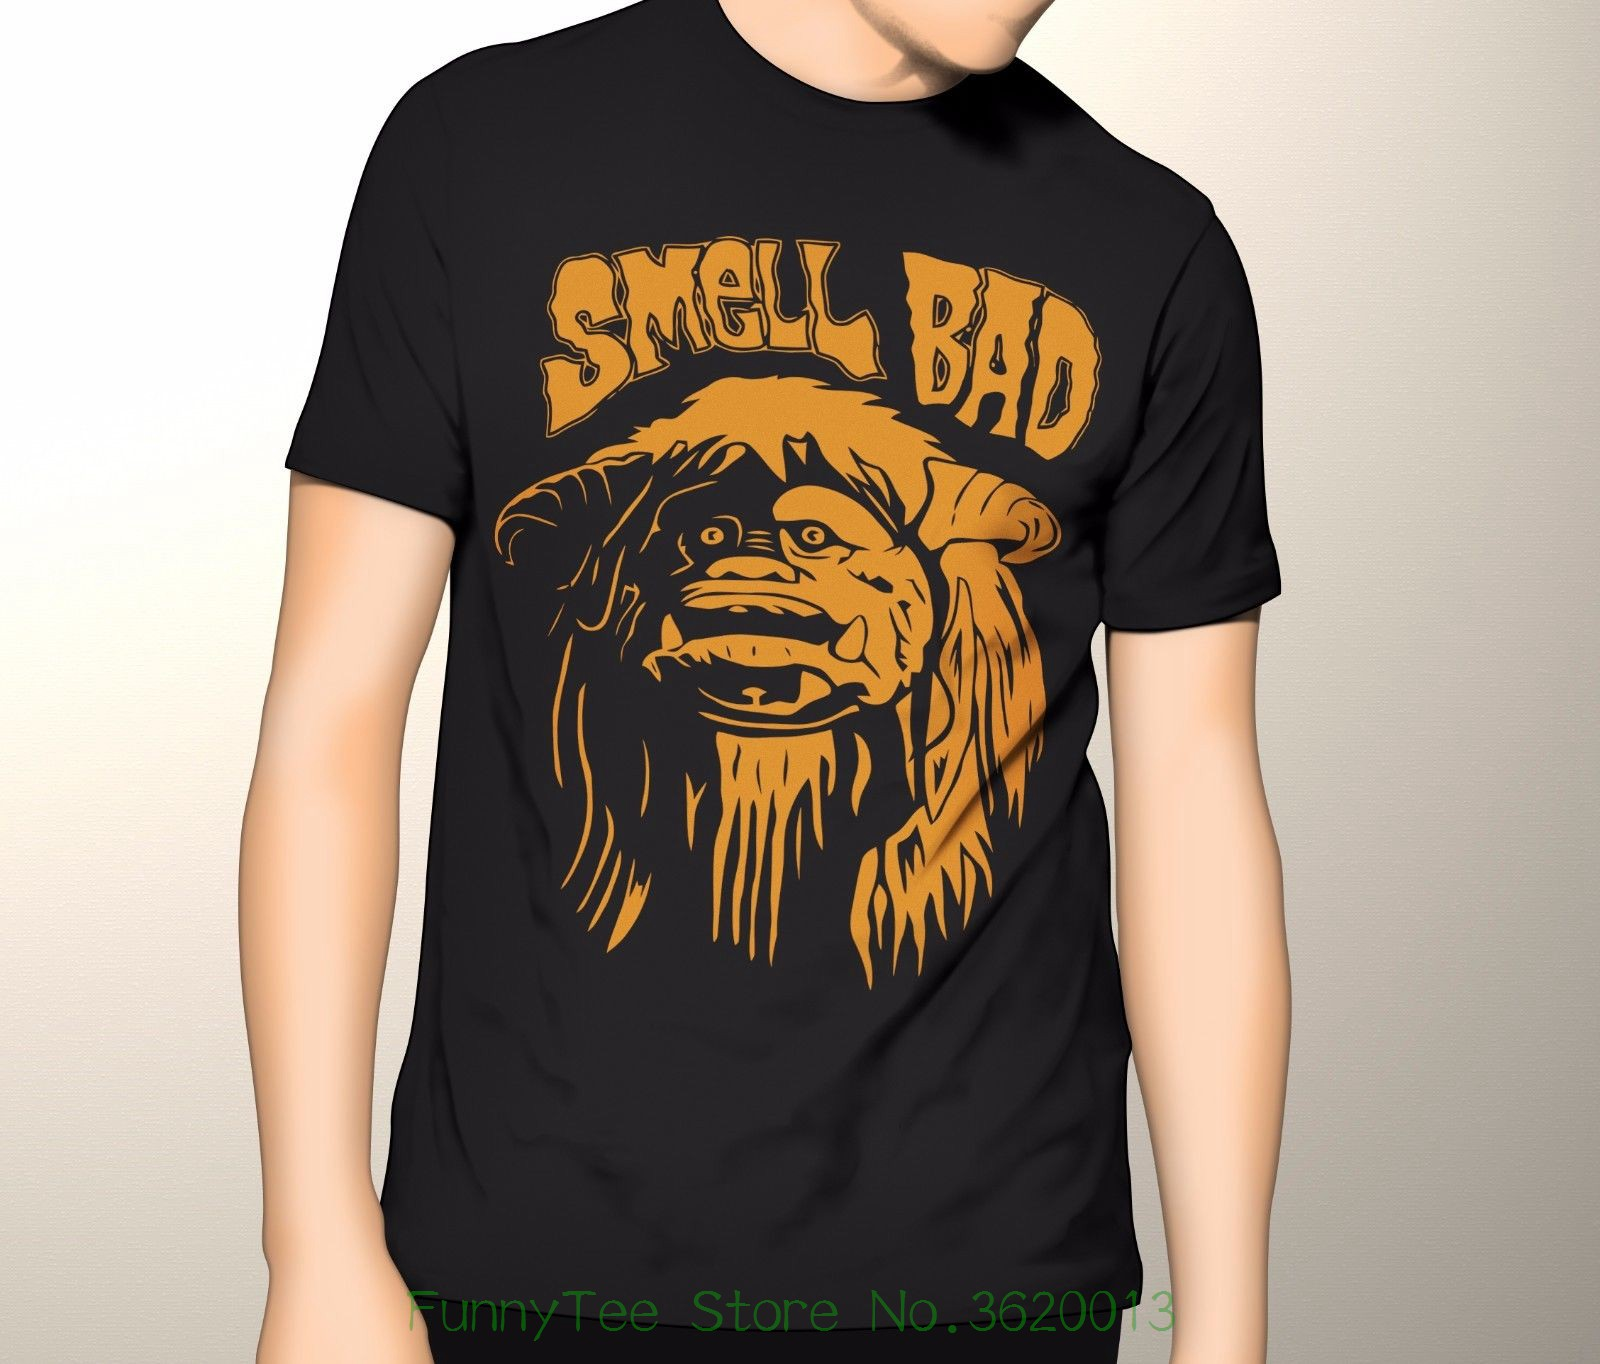 Labyrinth Shirt , Ludo Smell Bad Premium Graphic T-shirt S - 5xl